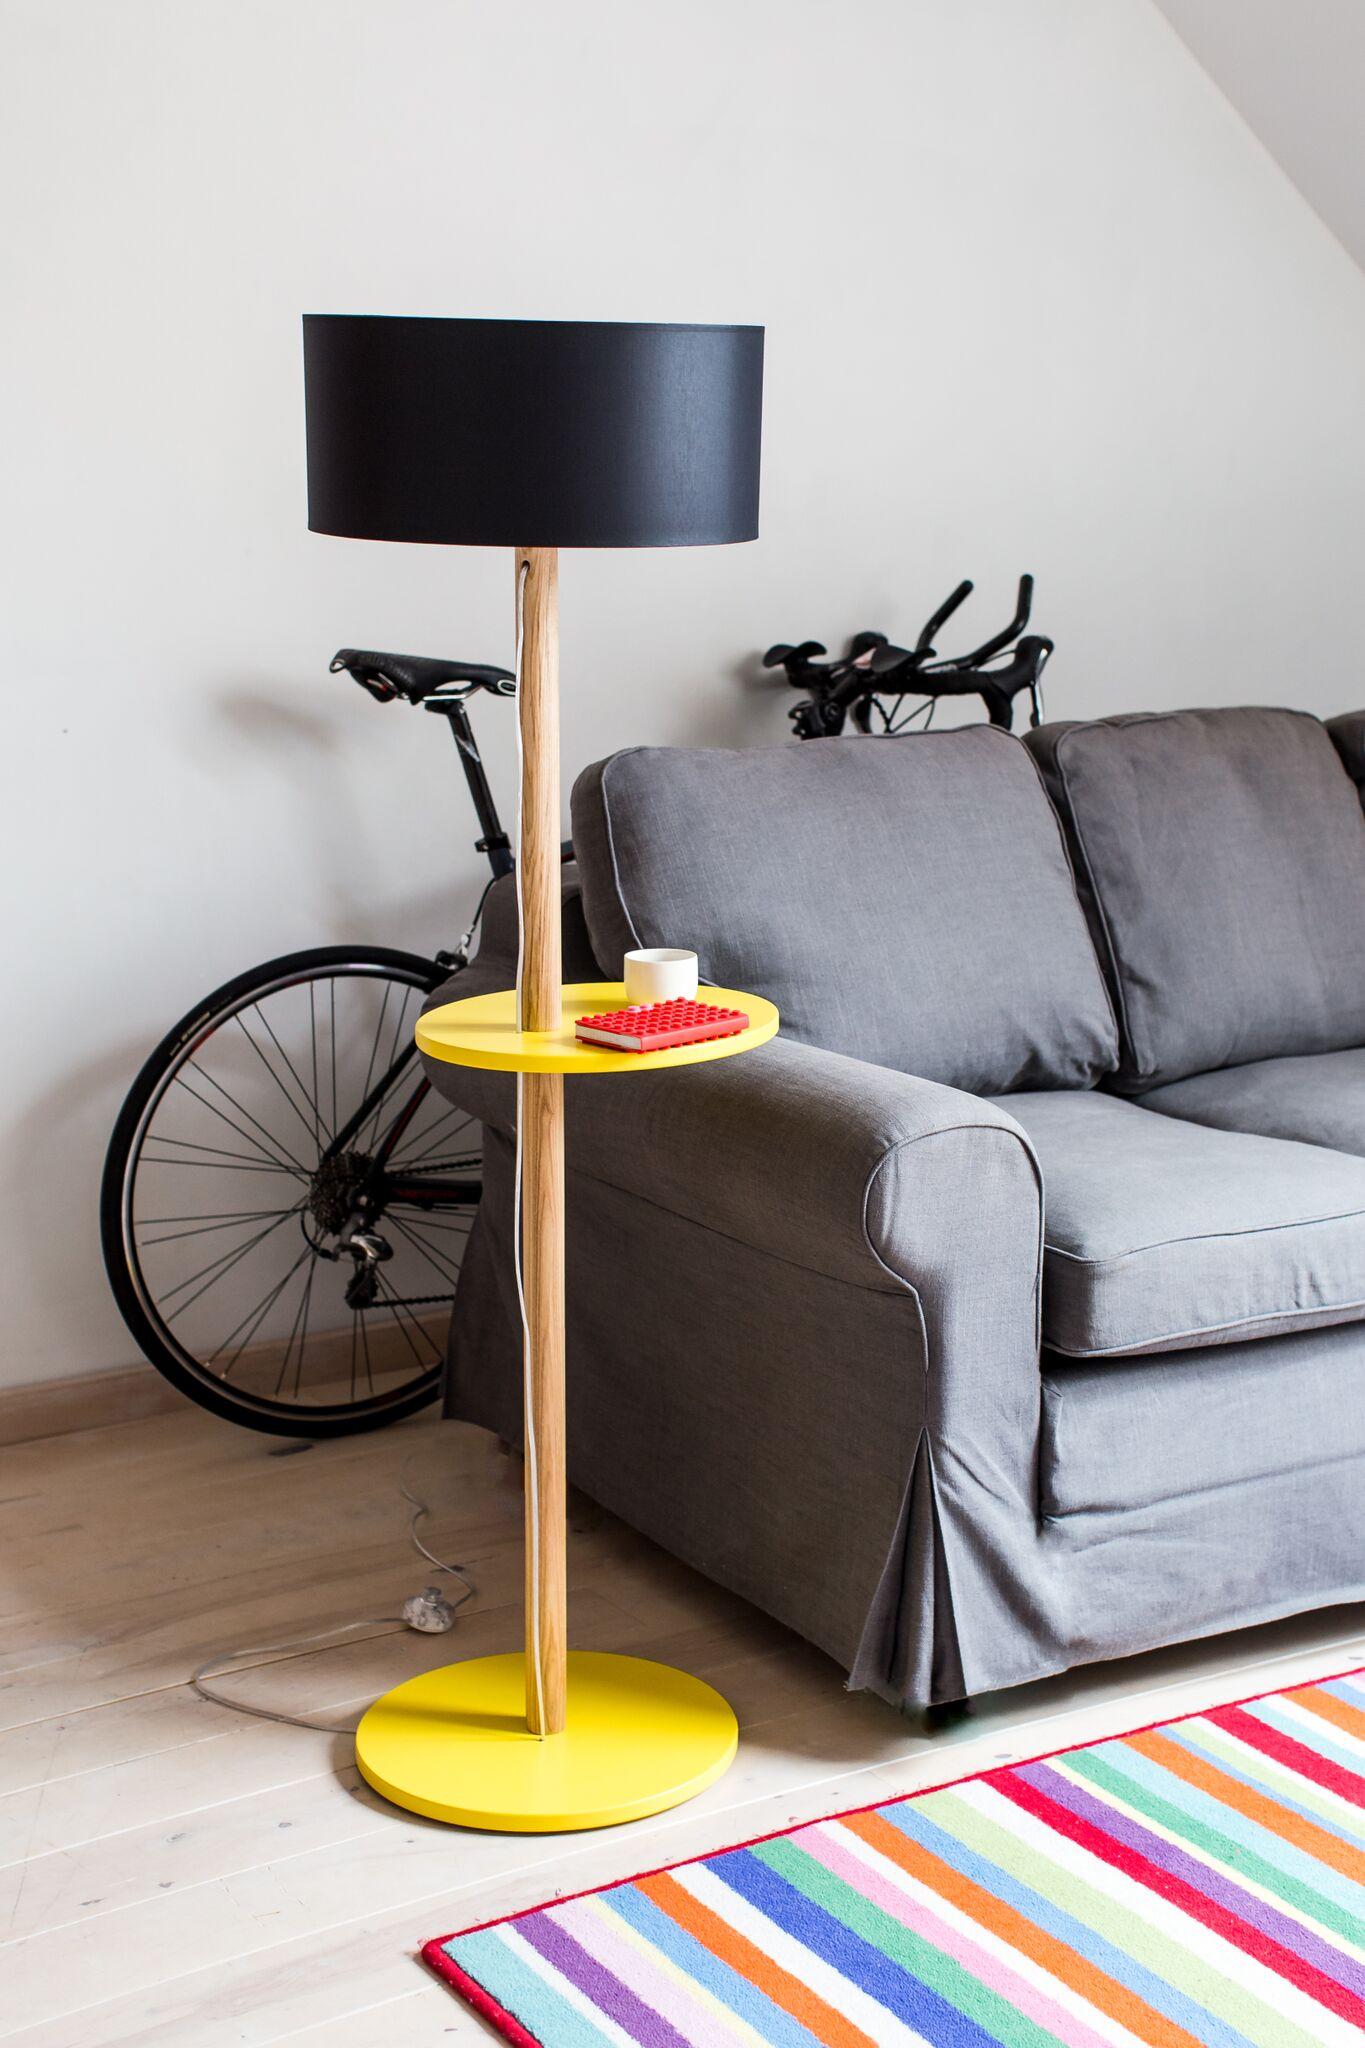 lampa ragaba ufo designerska ideal design